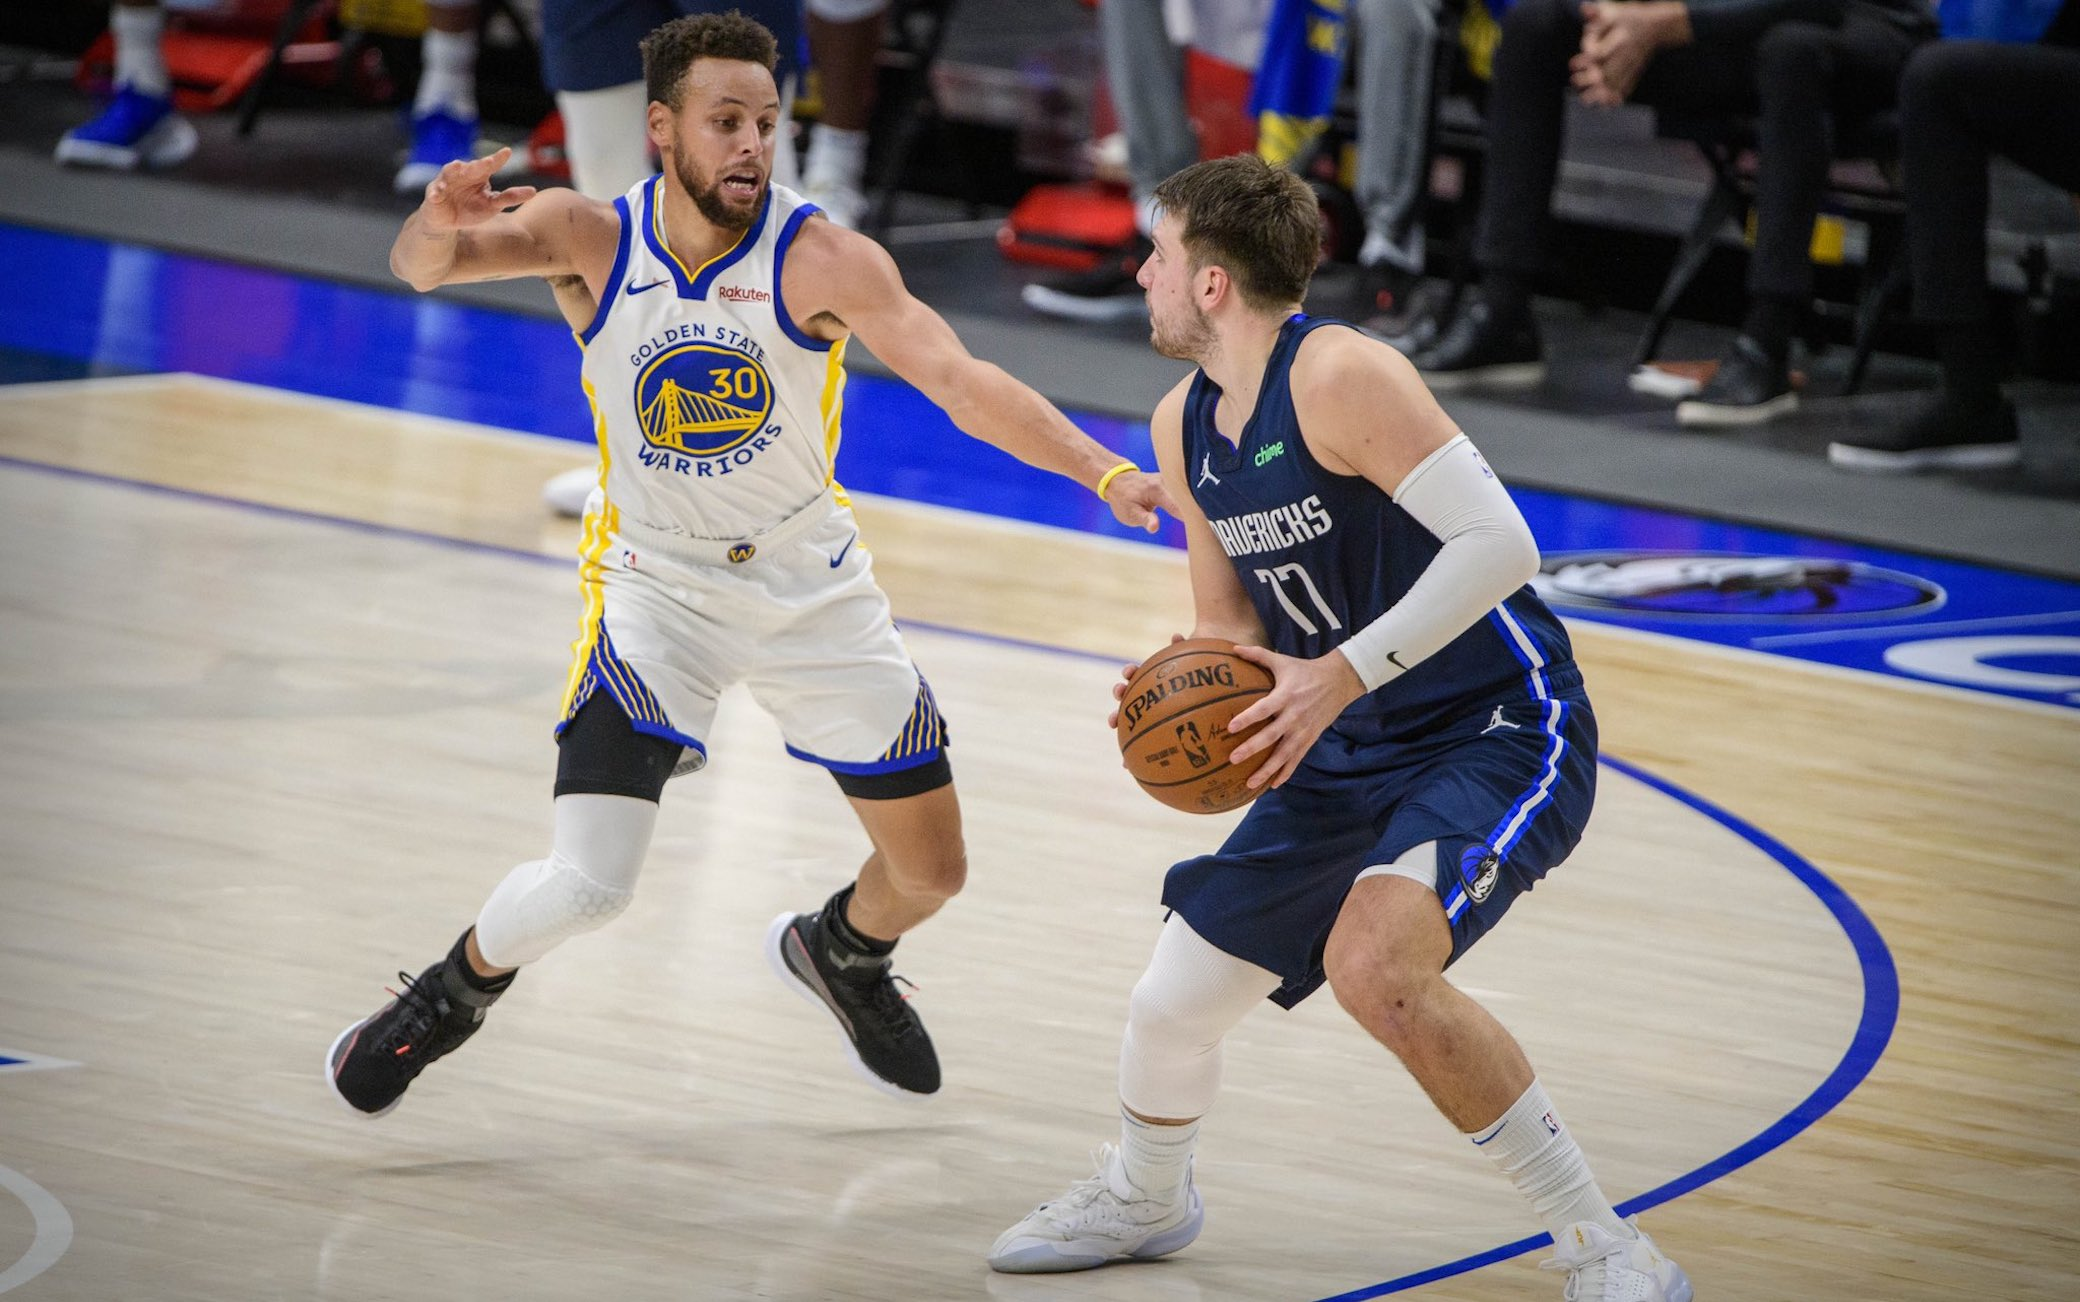 NBA, i risultati del 6 febbraio – Lakers ok sui Pistons dopo 2 OT, Luka Doncic (42) batte Stephen Curry (57), 50 di Nikola Jokic